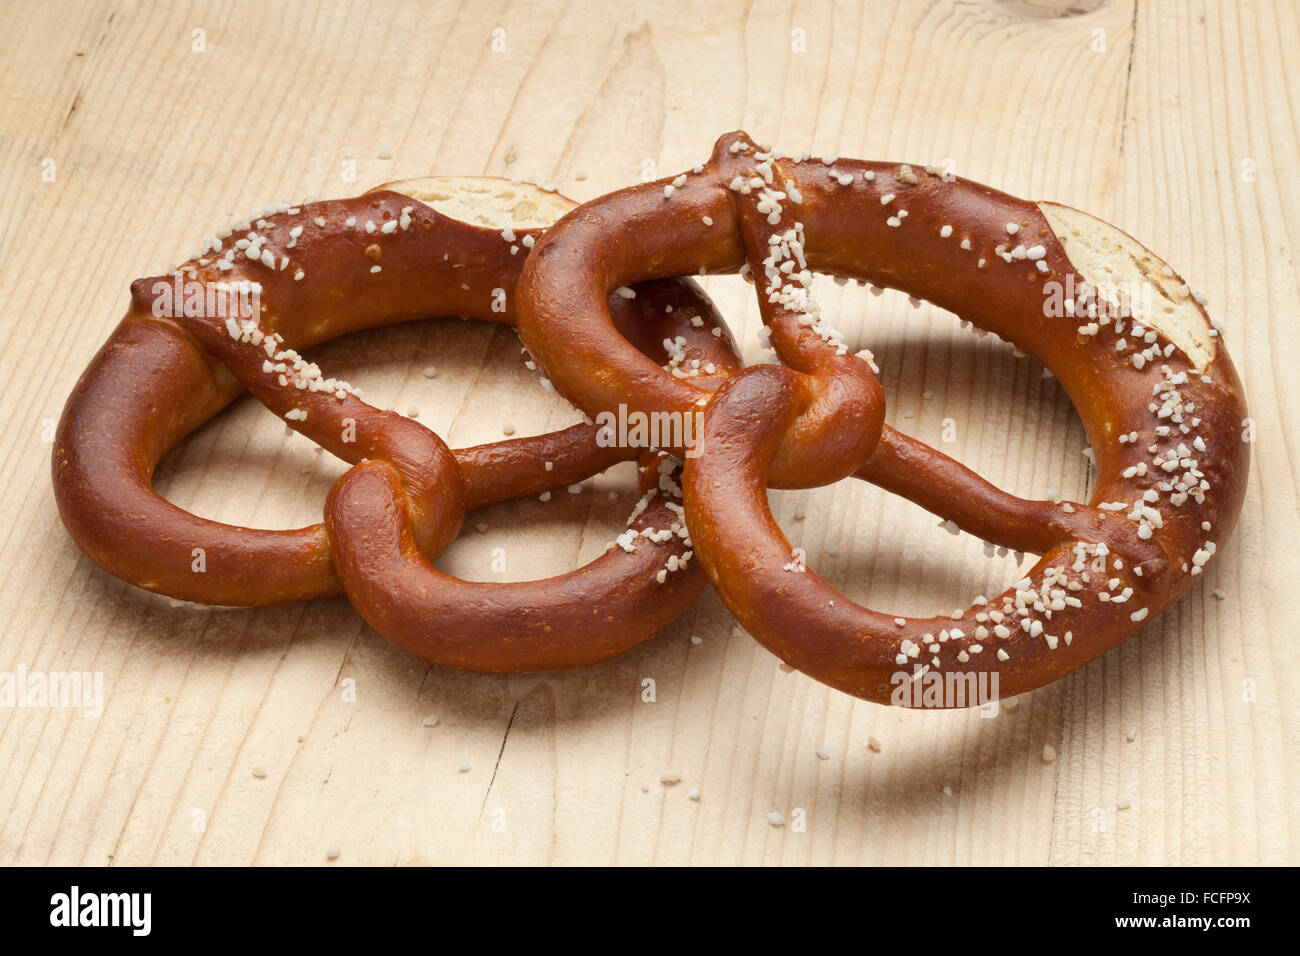 Two fresh soft pretzels with salt - Stock Image